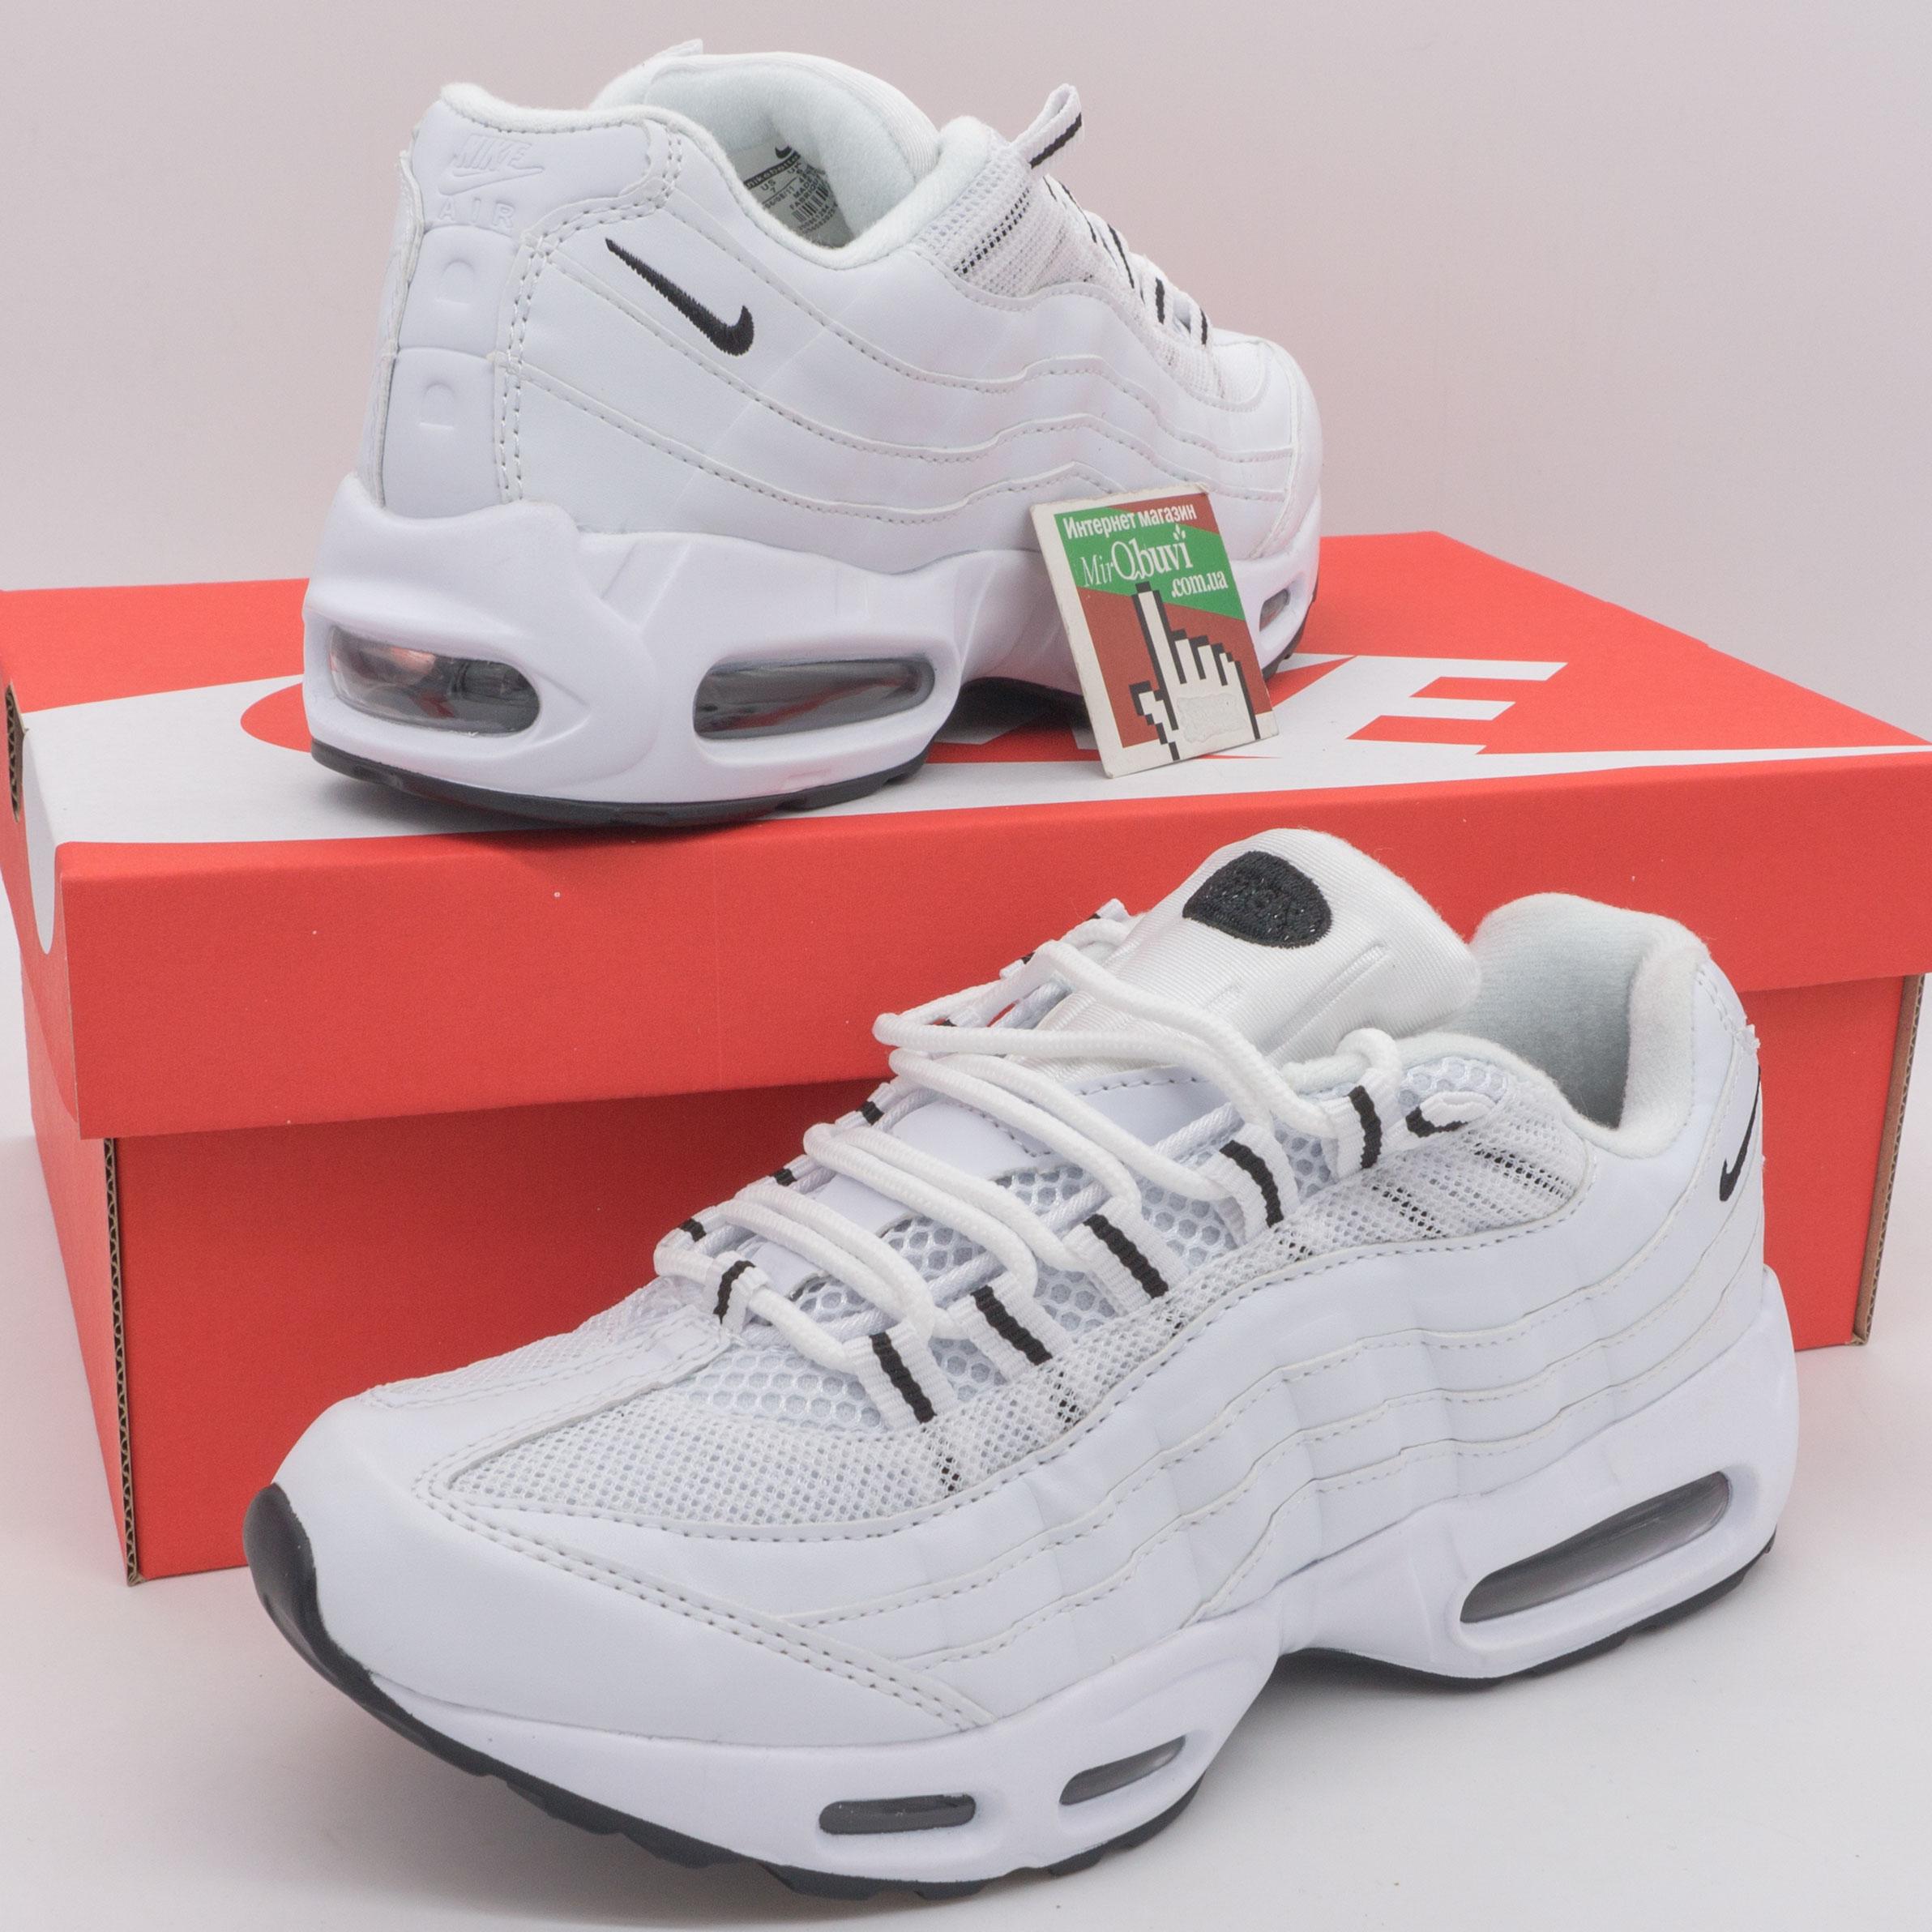 фото back Кроссовки Nike air max 95 полностью белые back